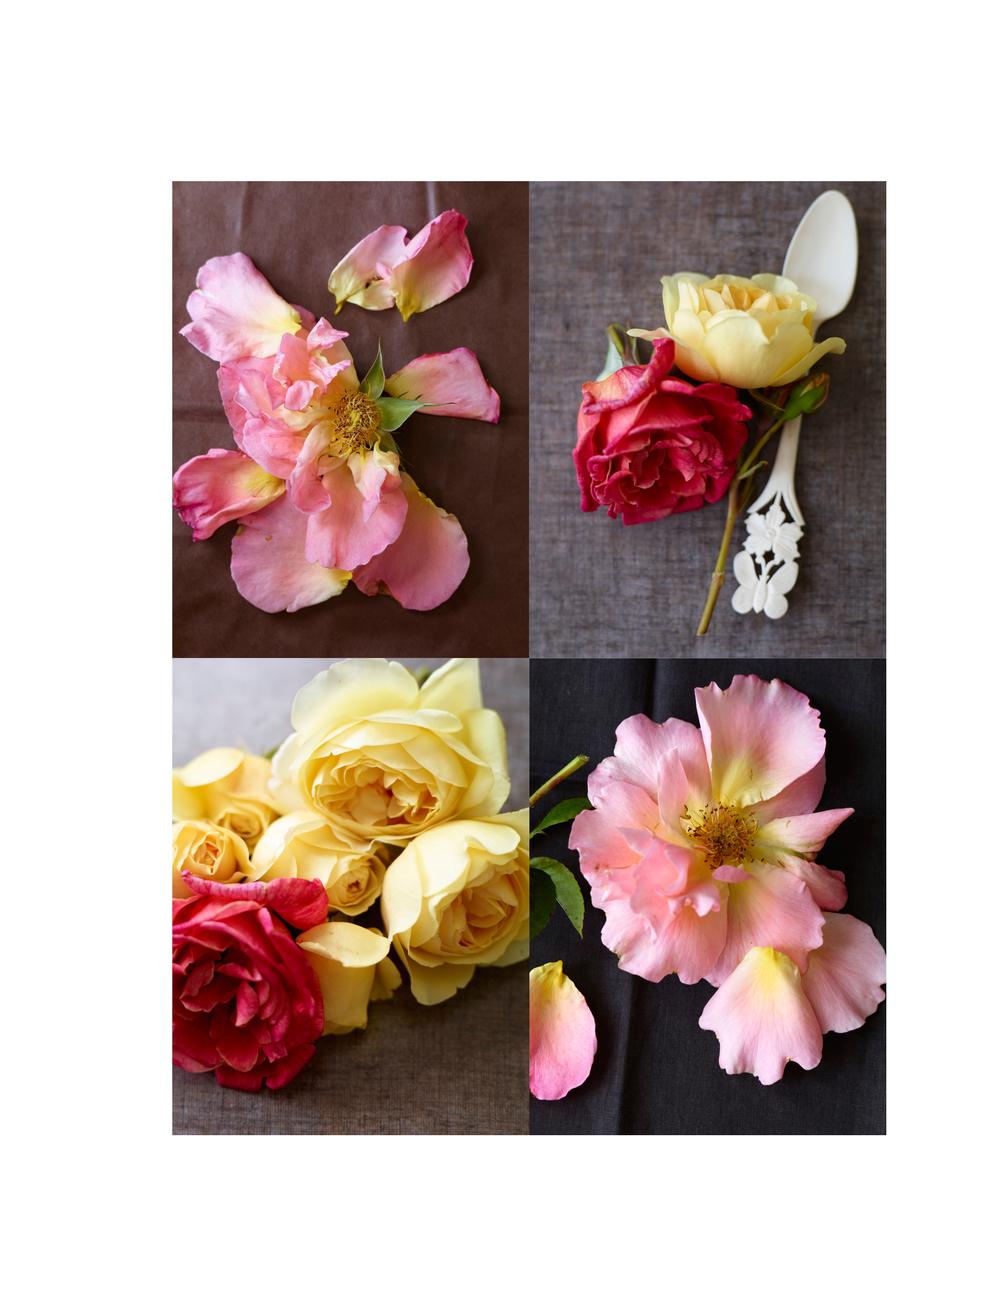 3 LB_*Roses.jpg